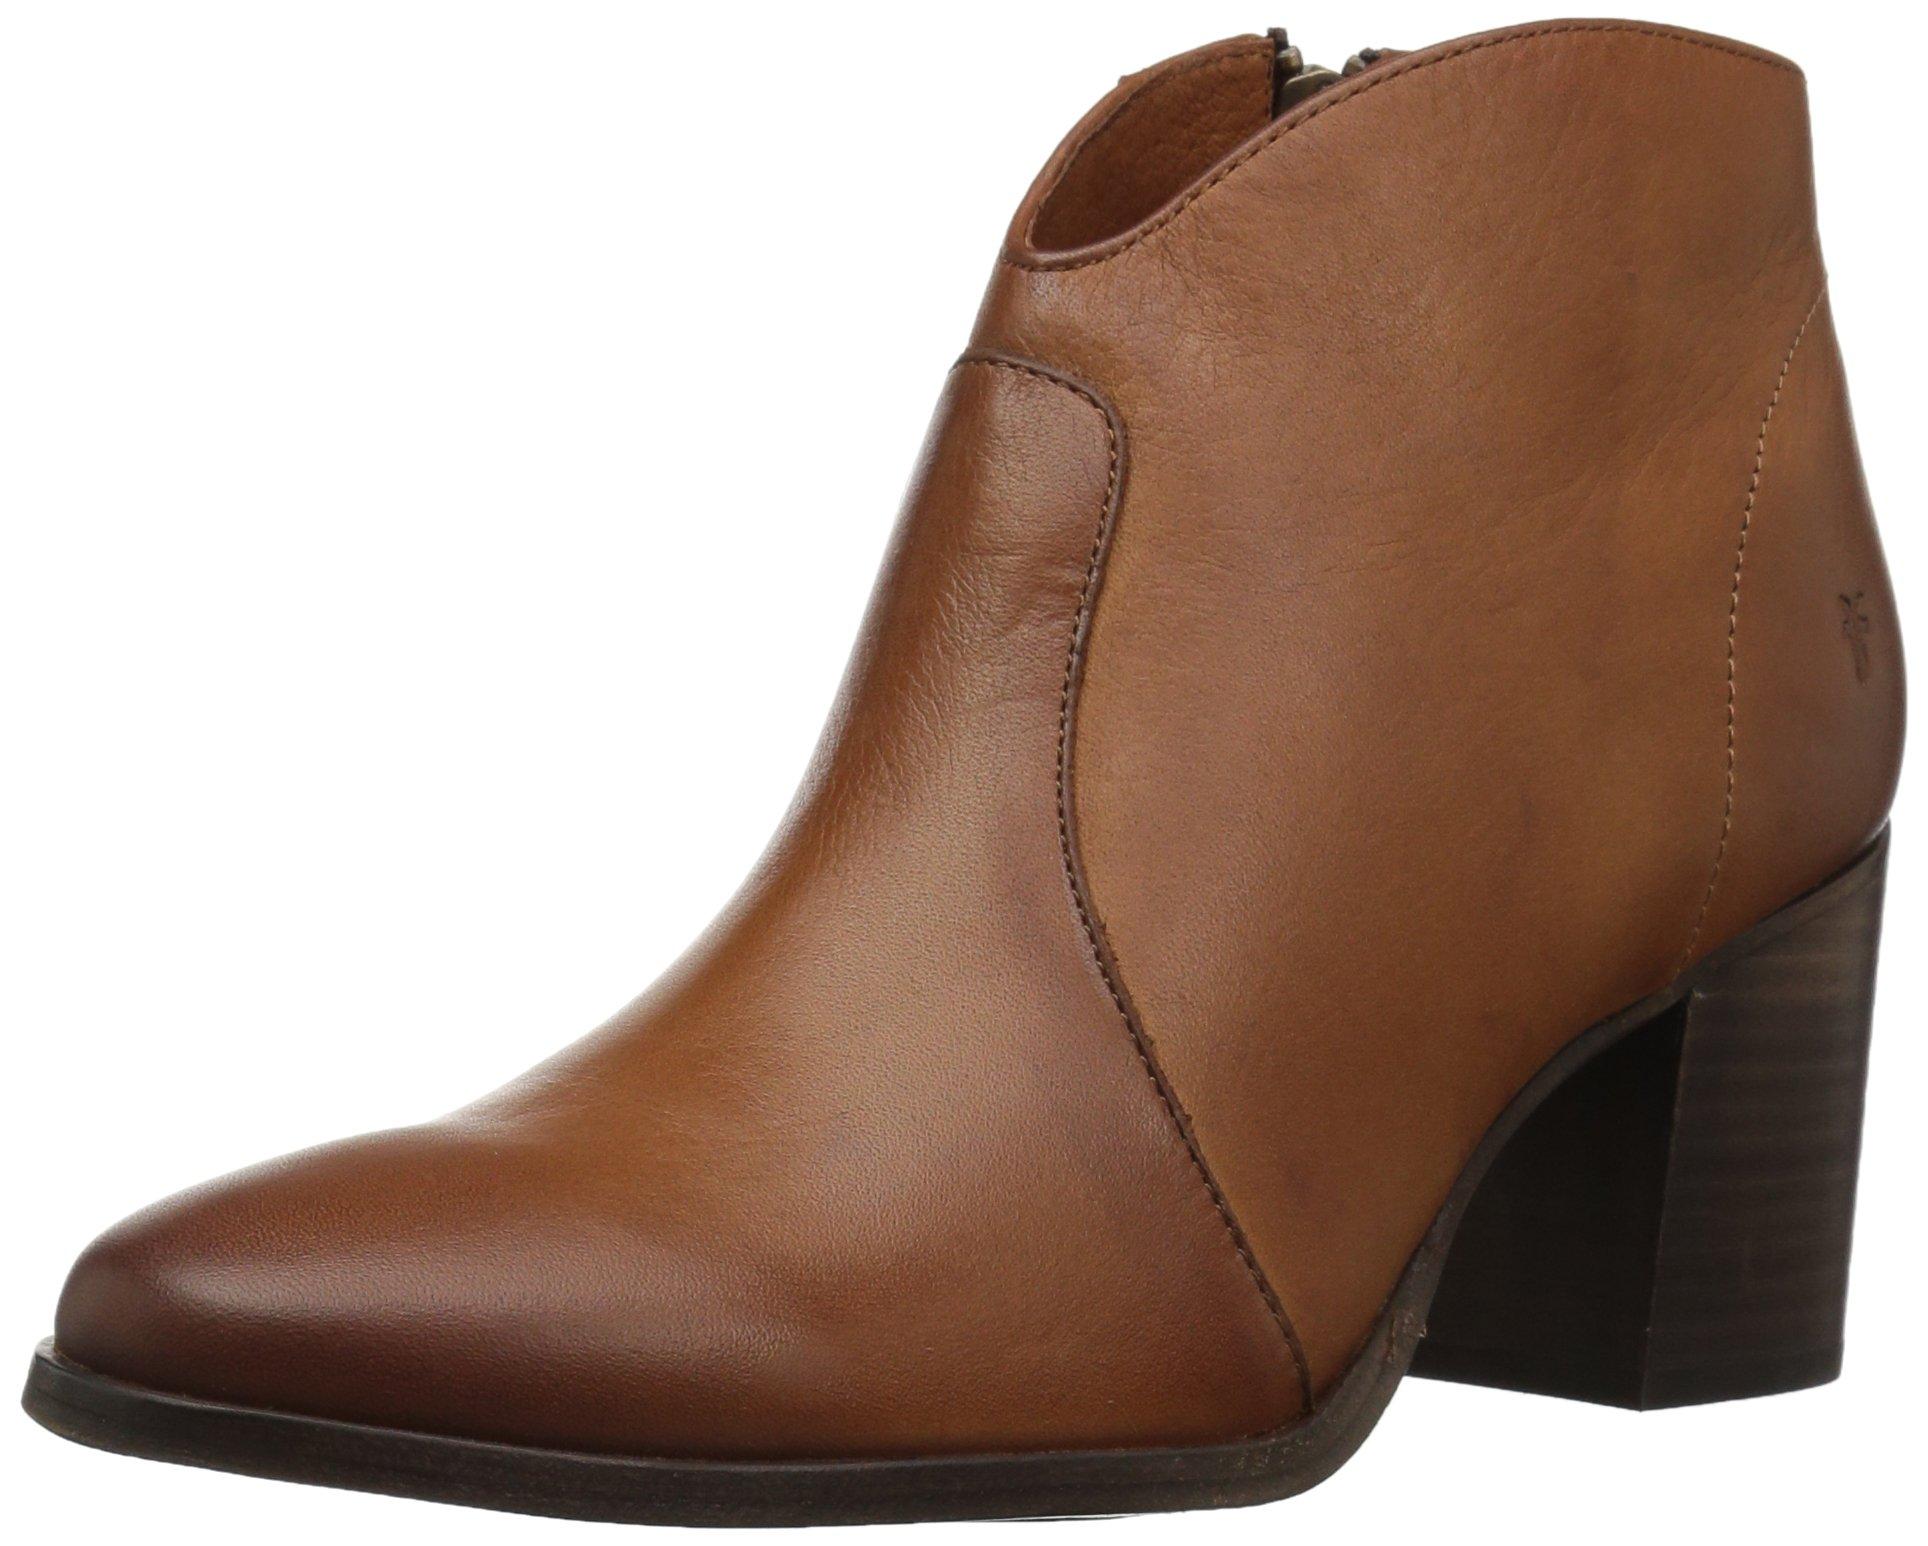 FRYE Women's Nora Zip Short Ankle Boot, Nutmeg, 9 M US